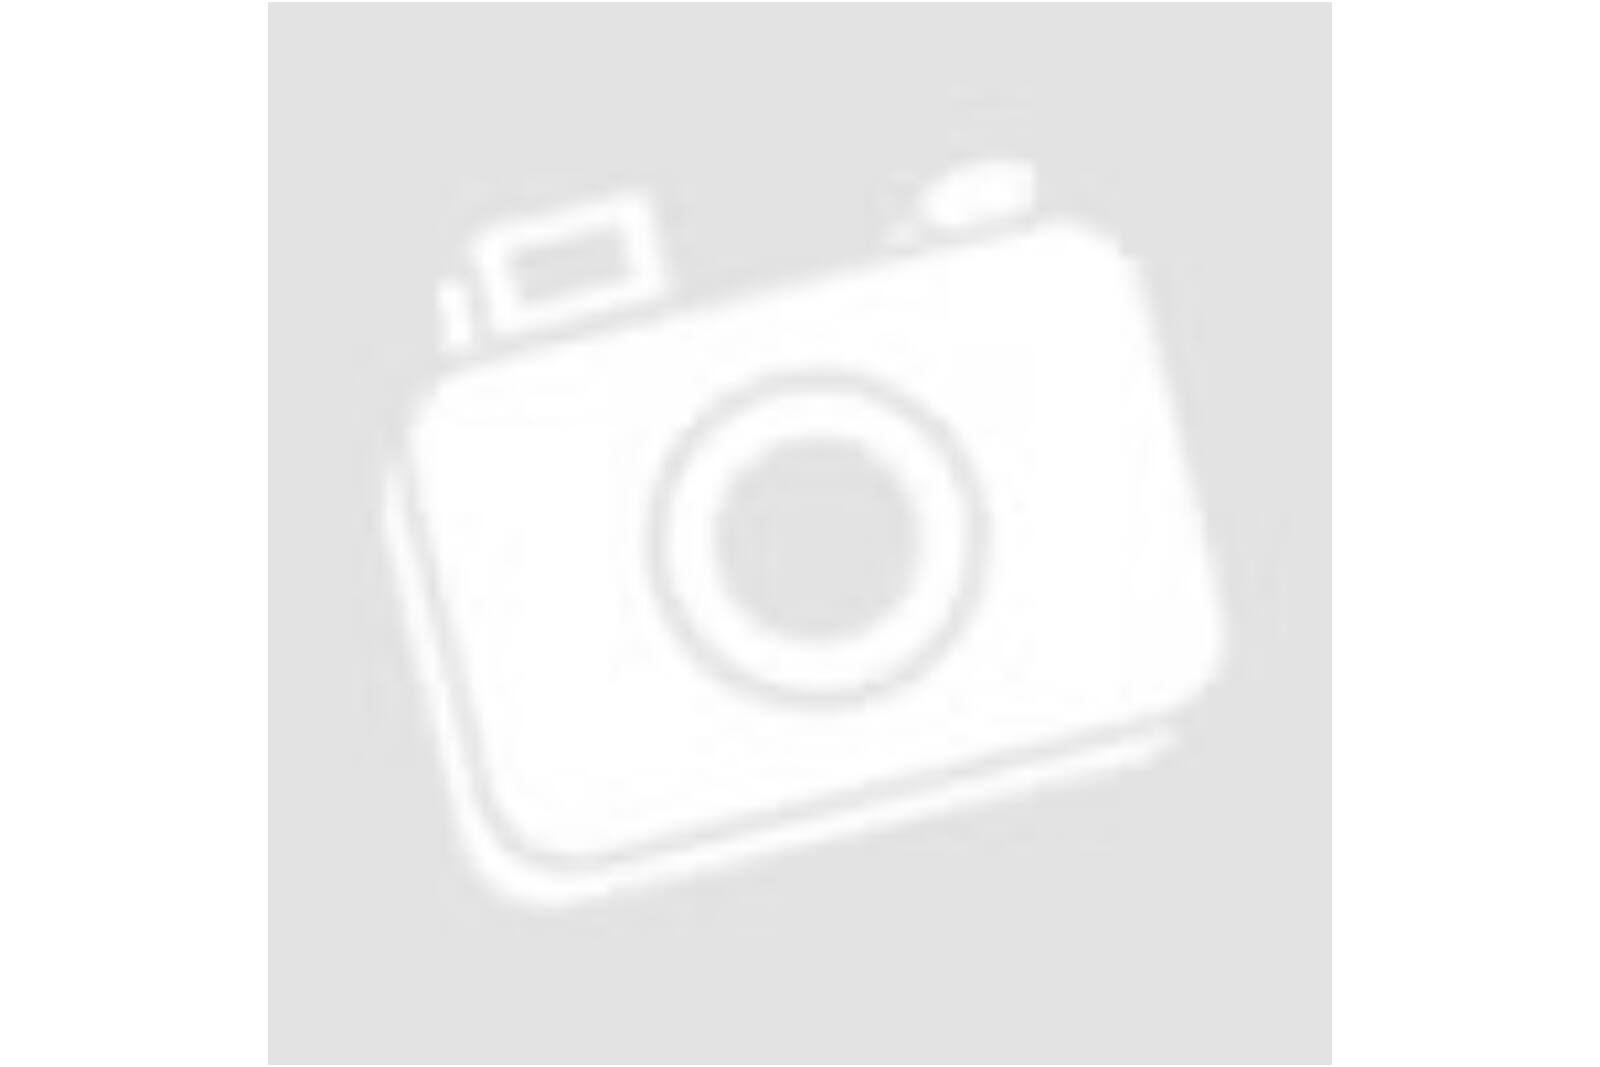 28334ecf65 Desigual kék, virágos női kabát – 40 - Női kabátok